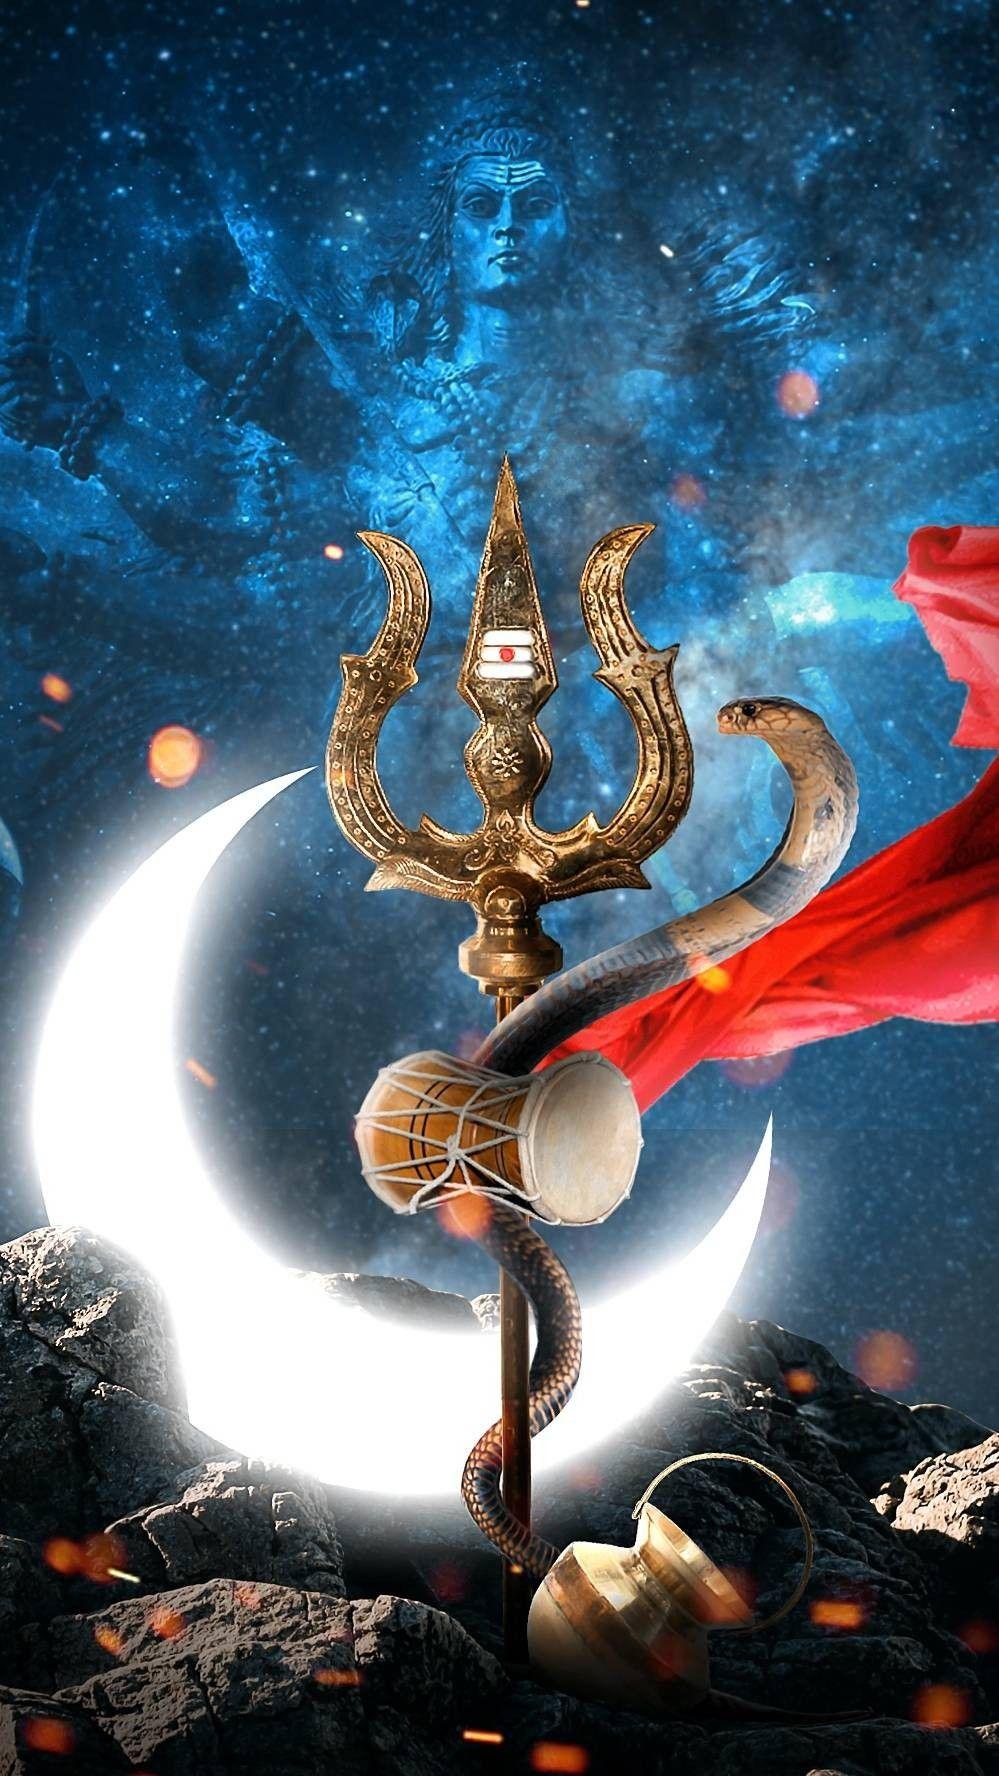 Pin By Rahul Gaur On Lord Mahadev Shiva Lord Wallpapers Lord